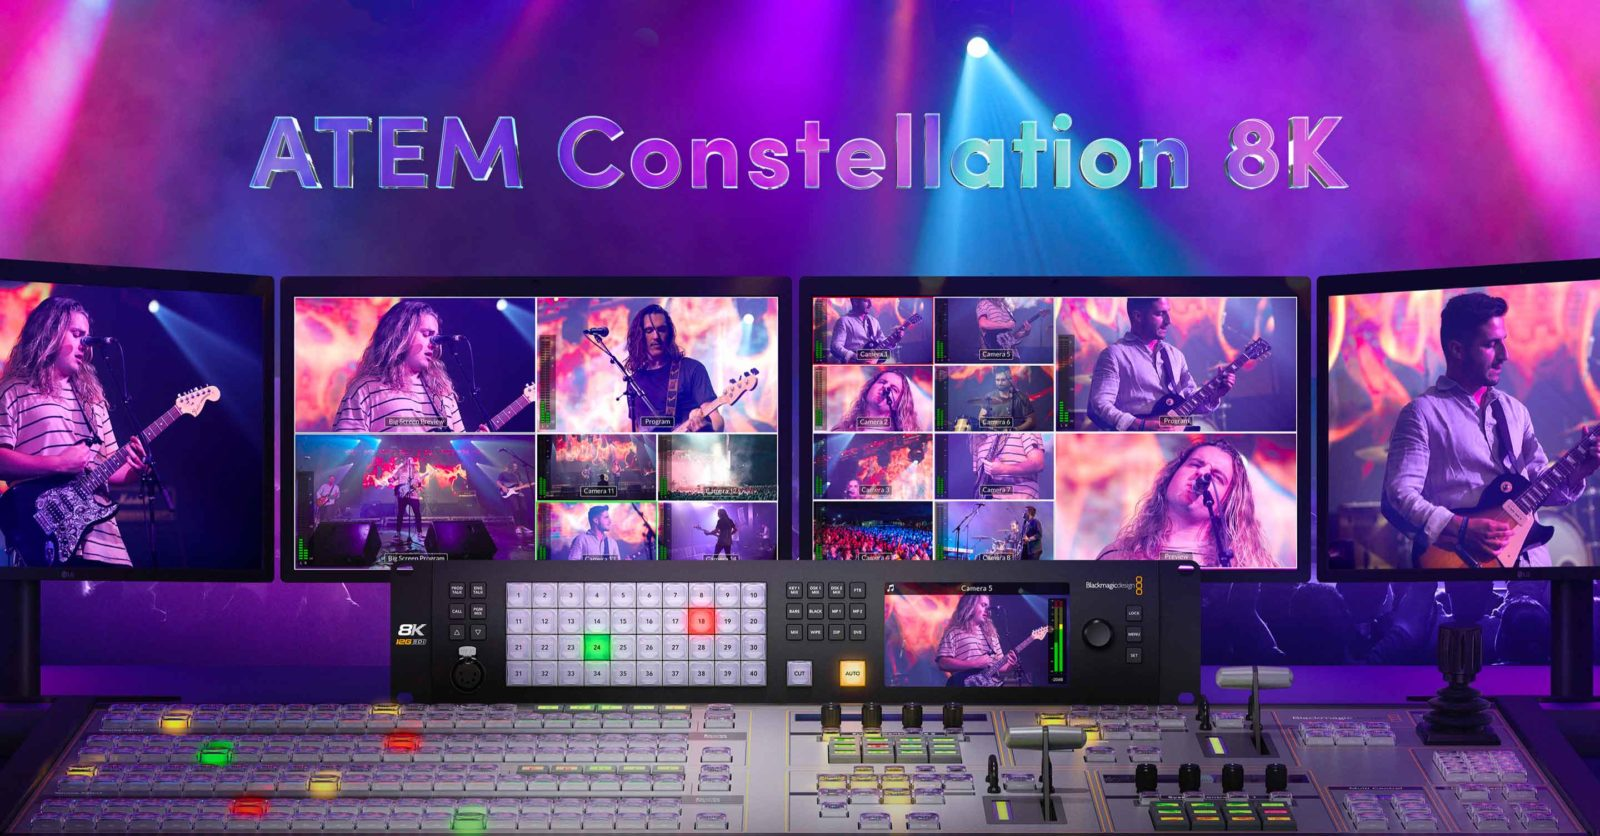 ATEM Constellation 8K